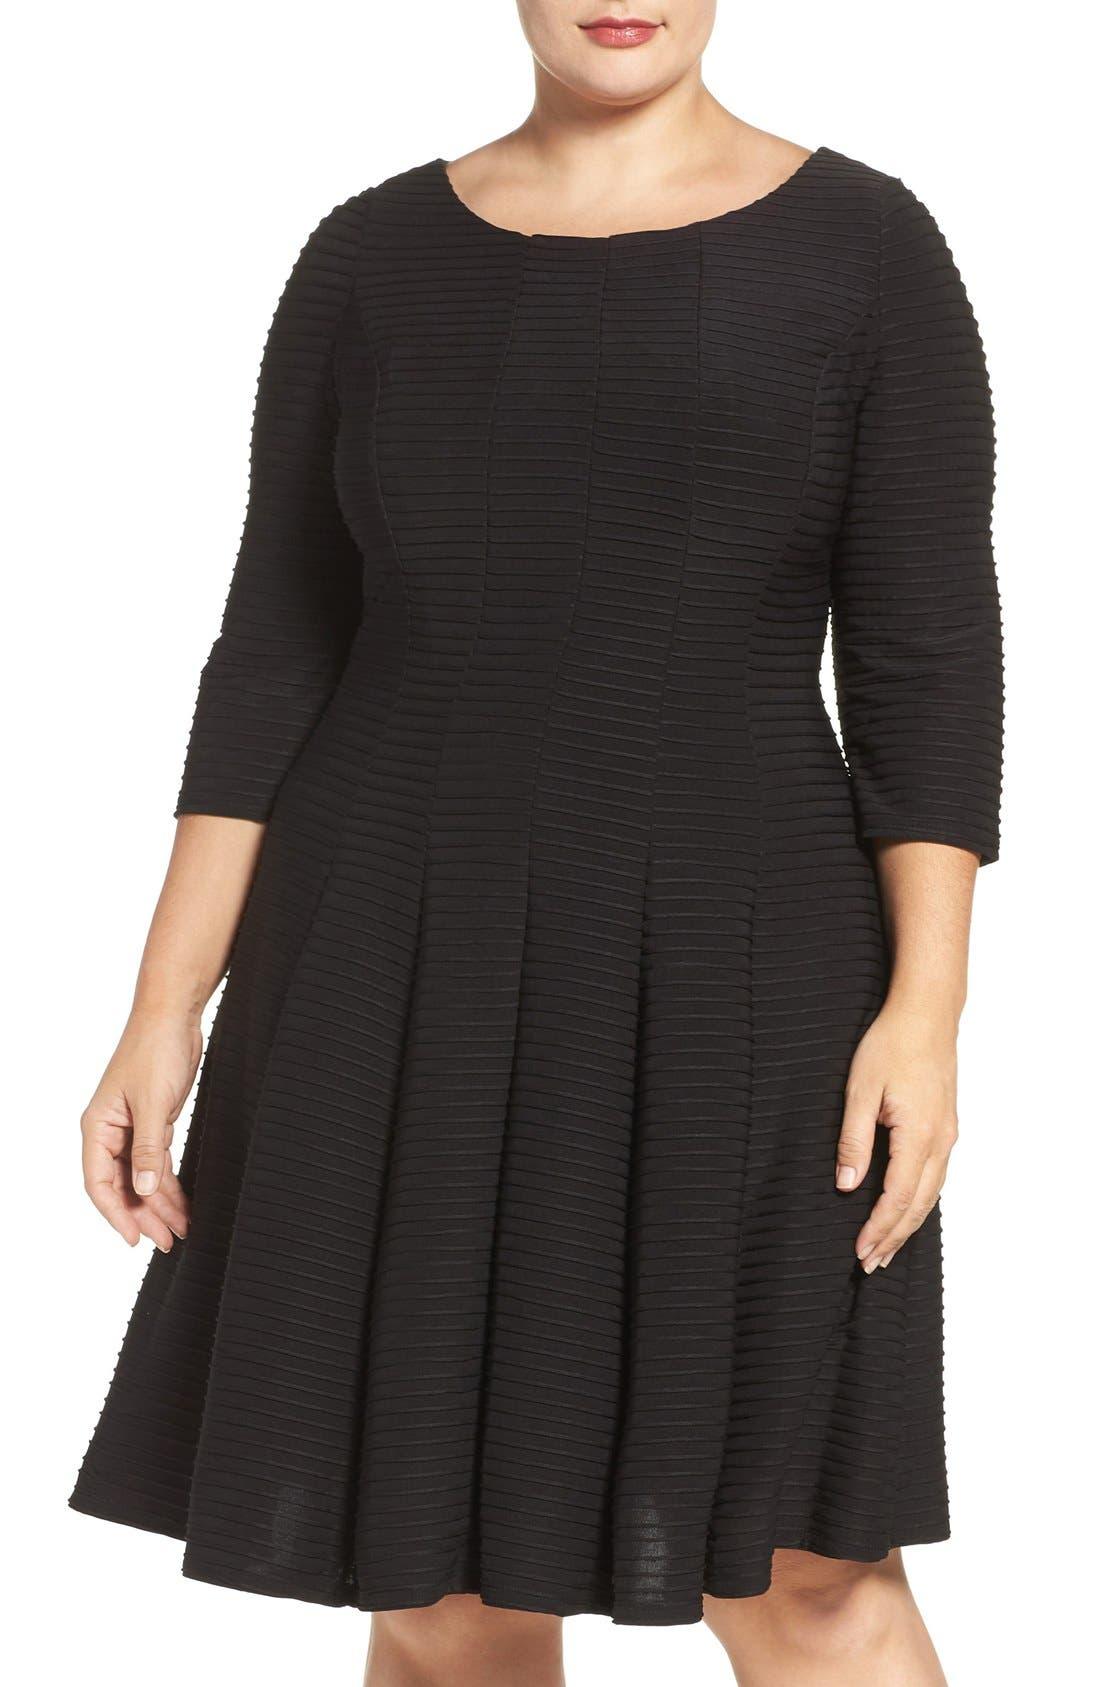 Main Image - Gabby Skye Pintuck Knit Fit & Flare Dress (Plus Size)